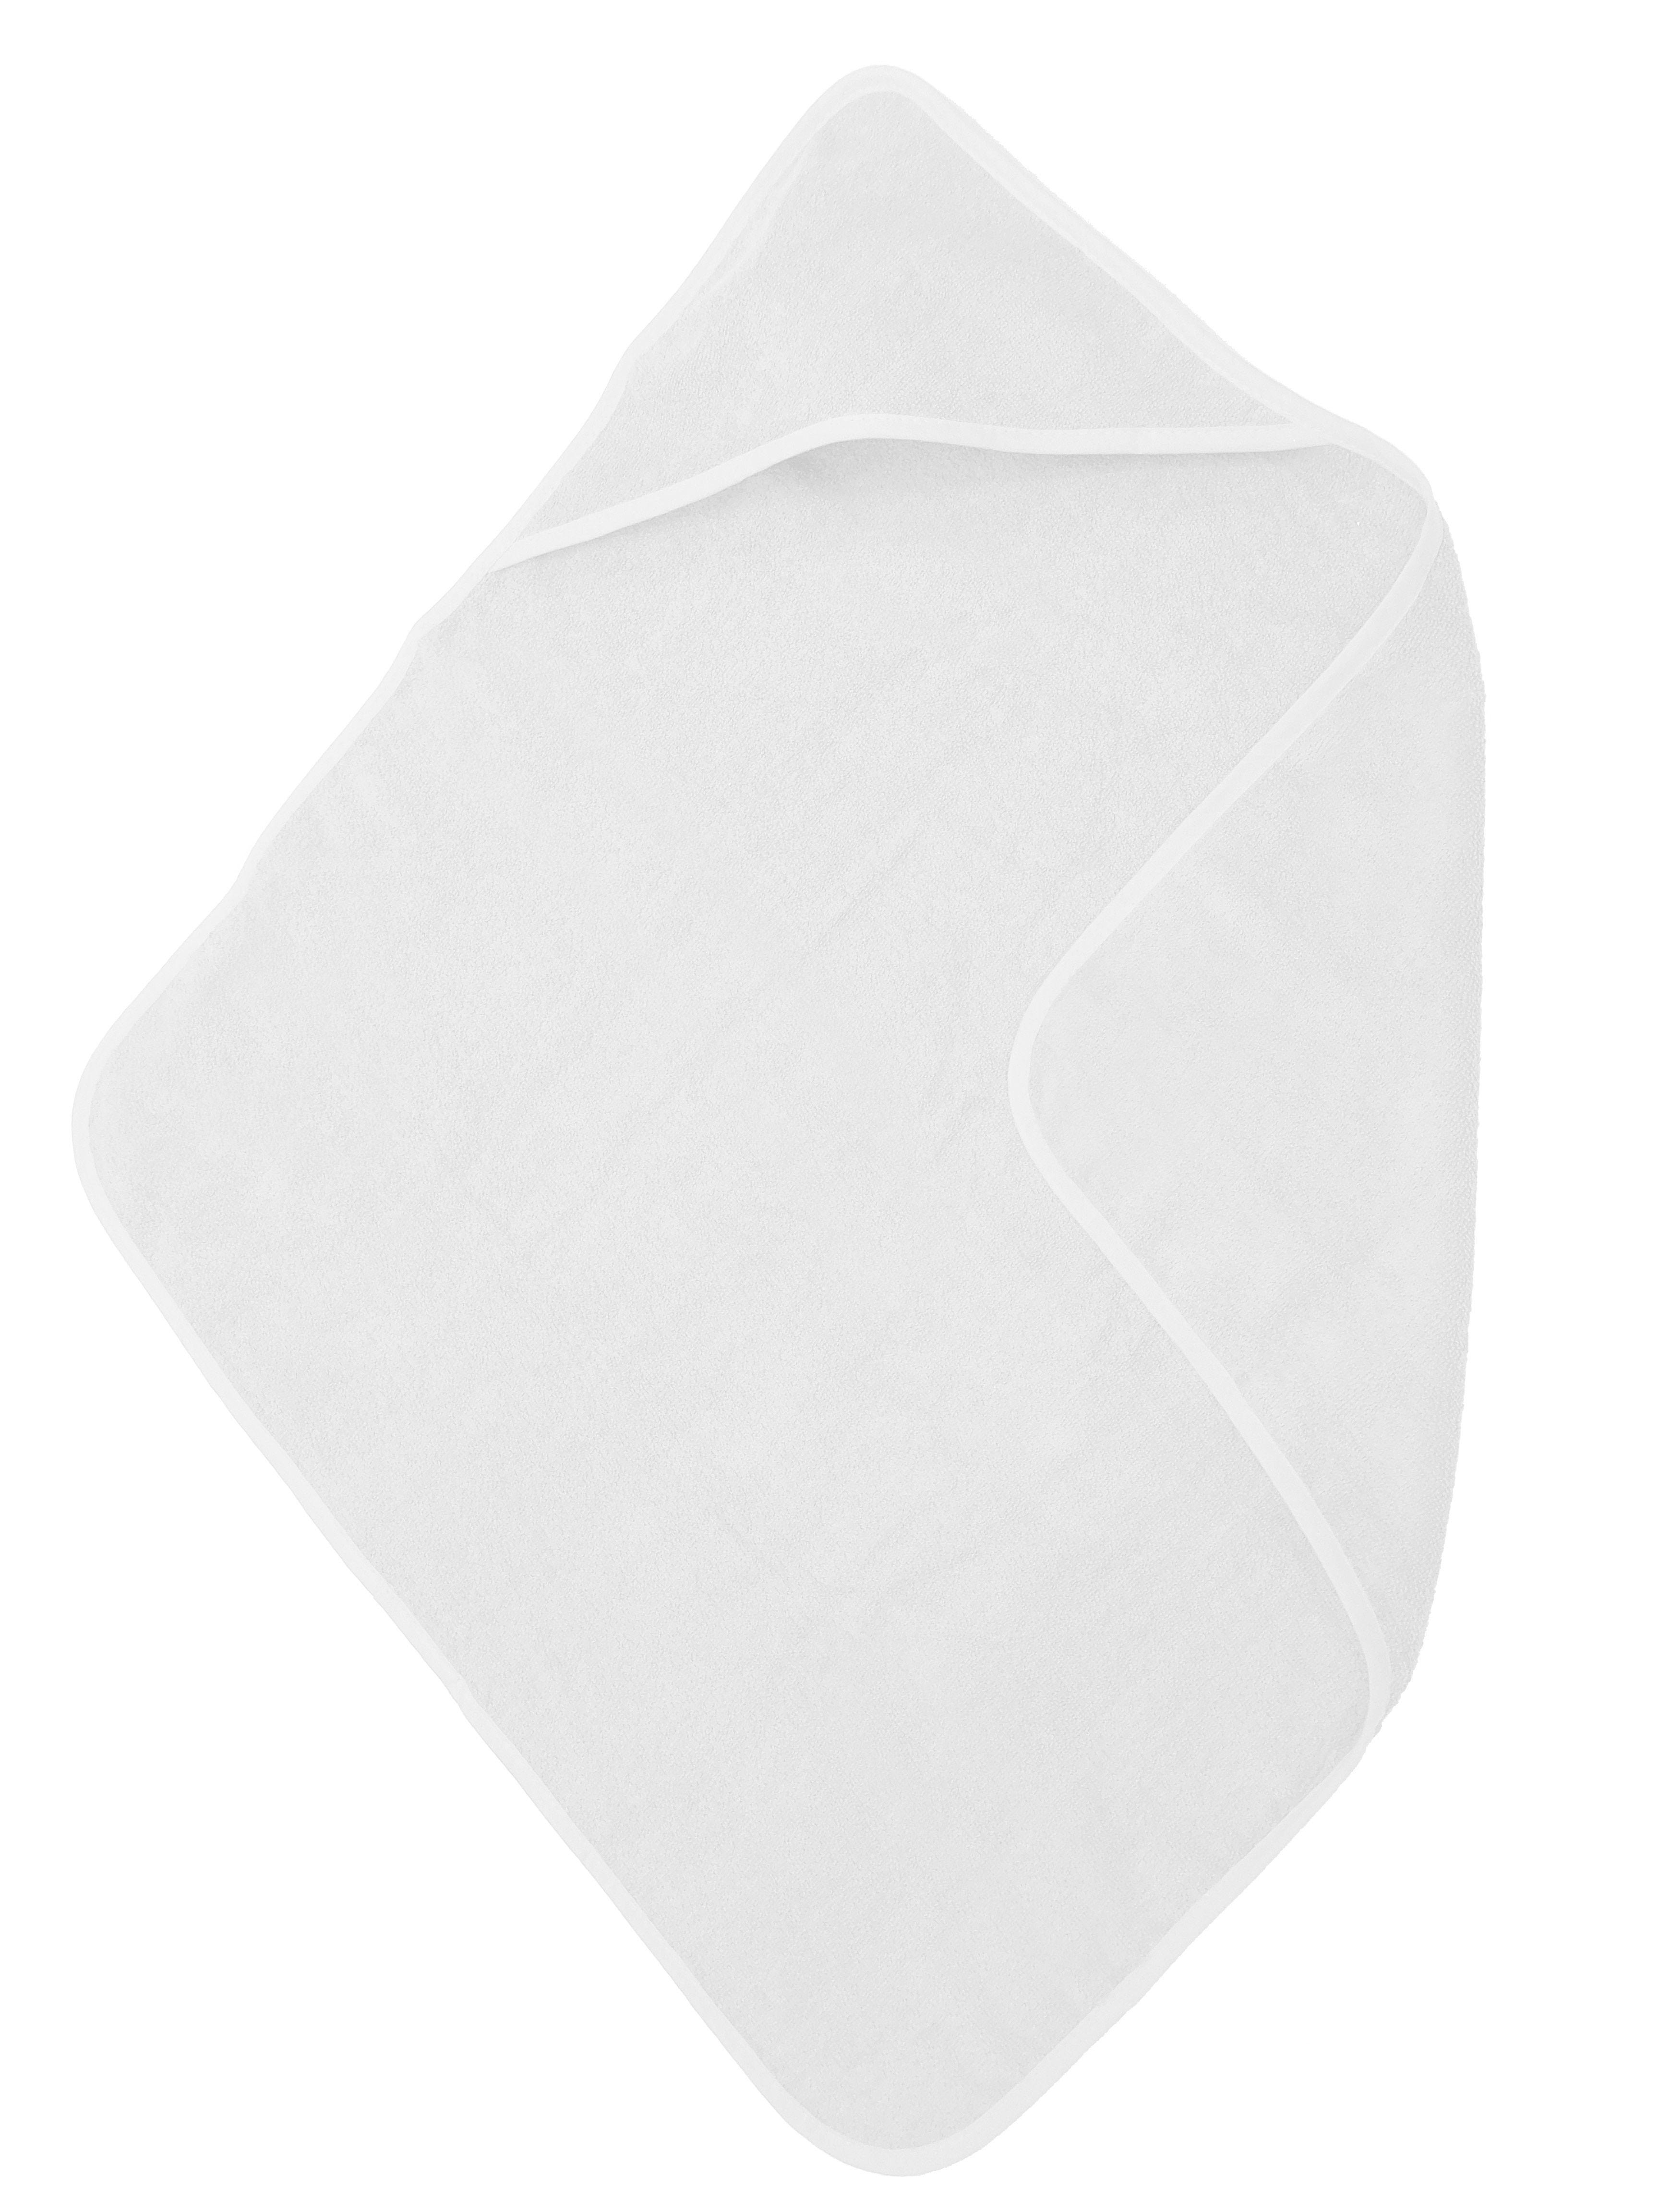 a9ebd9c7e60 Merk: the one model: baby handdoek kwaliteit: 450 gr/m2 materiaal: